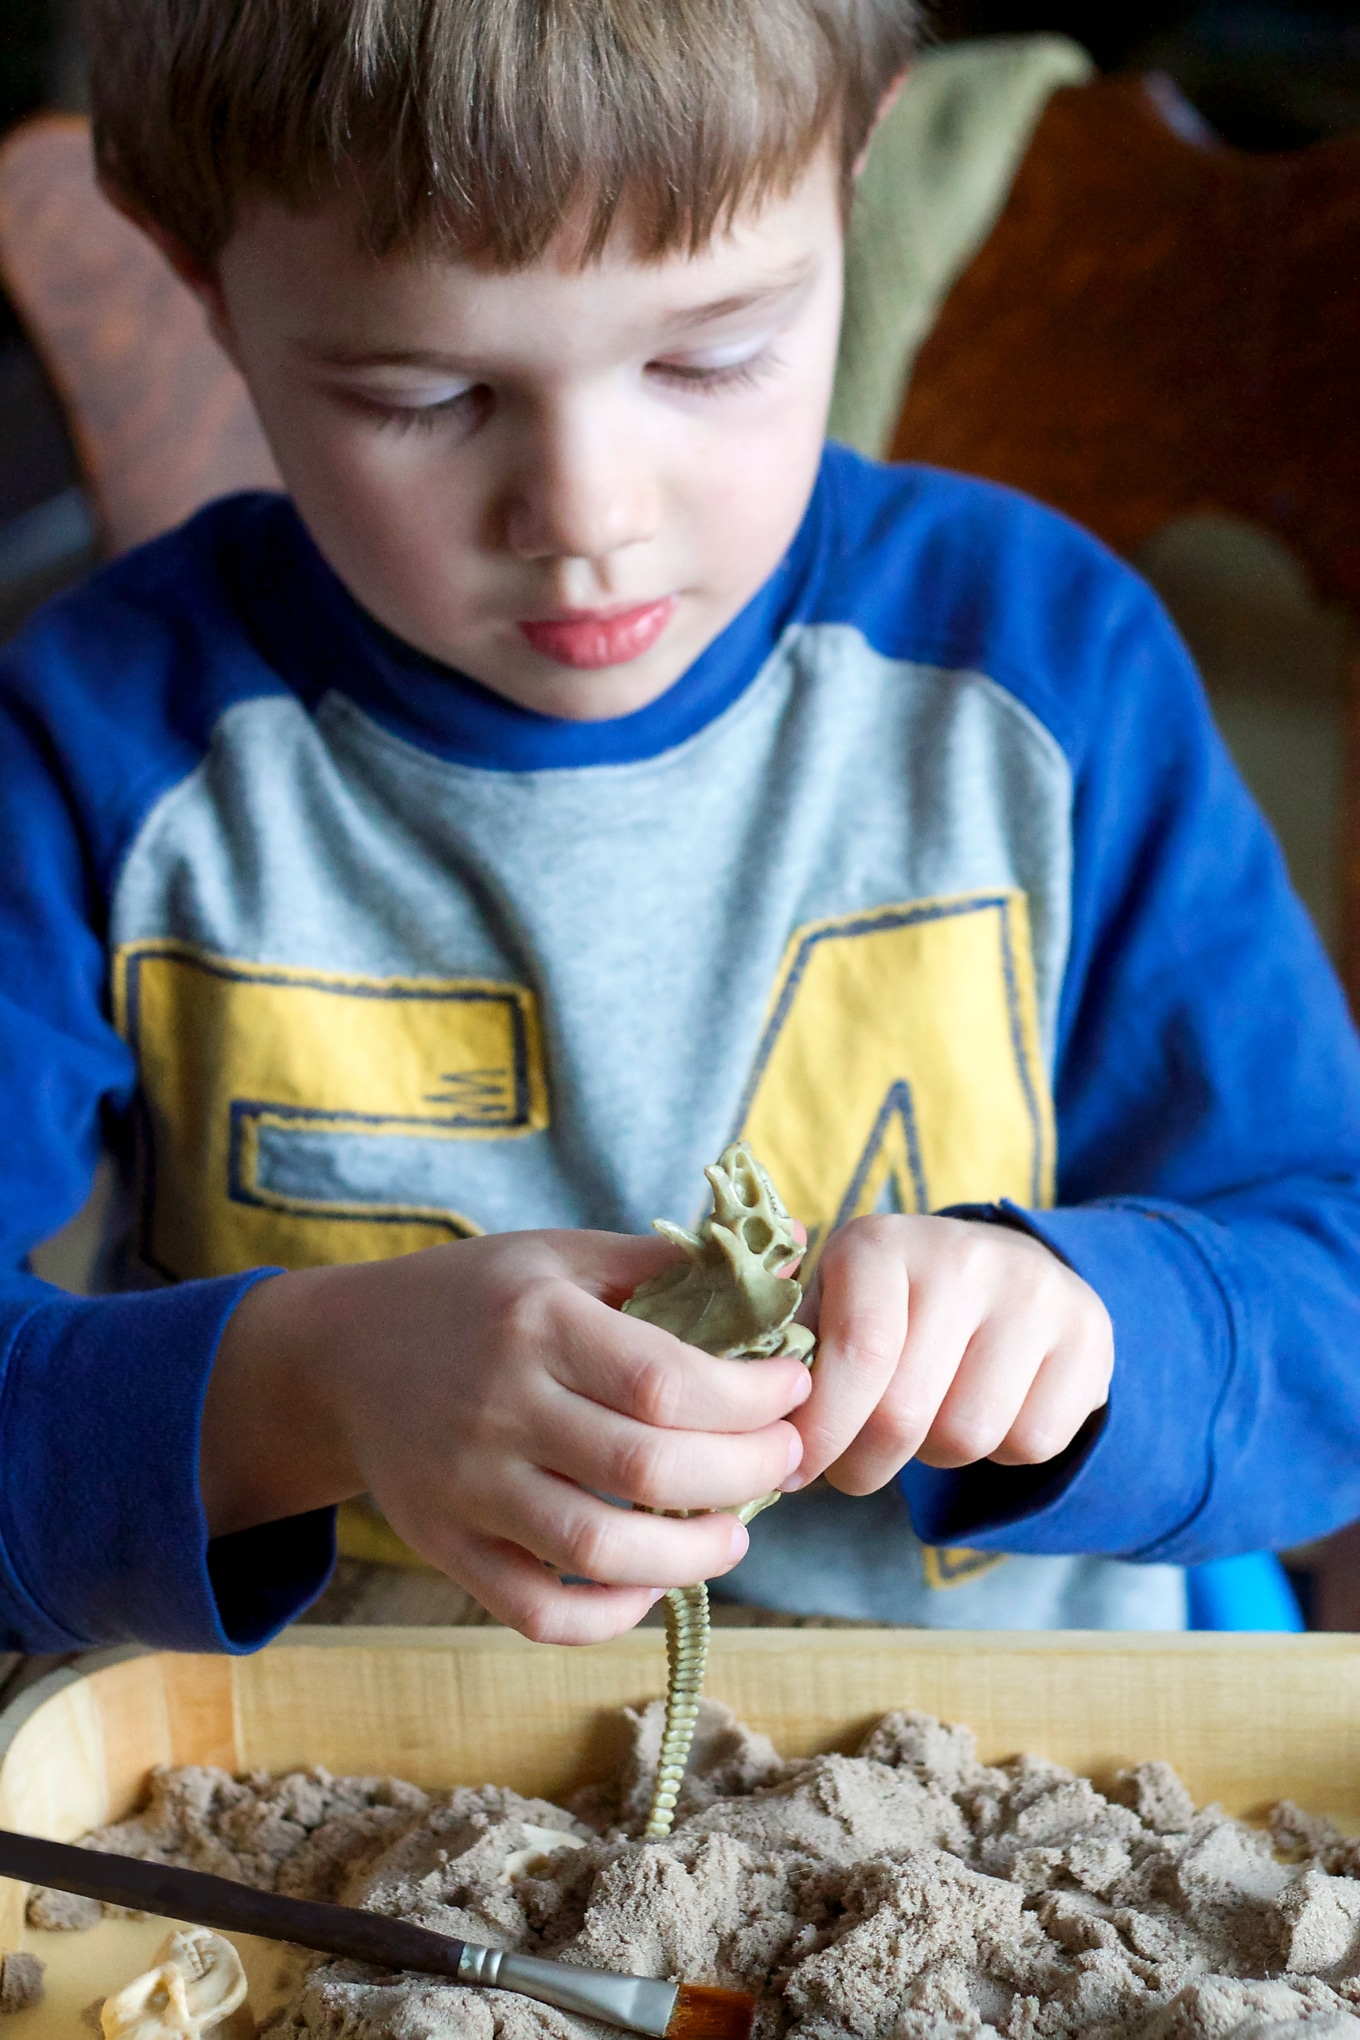 Preschooler Digging for Dinosaur Bones